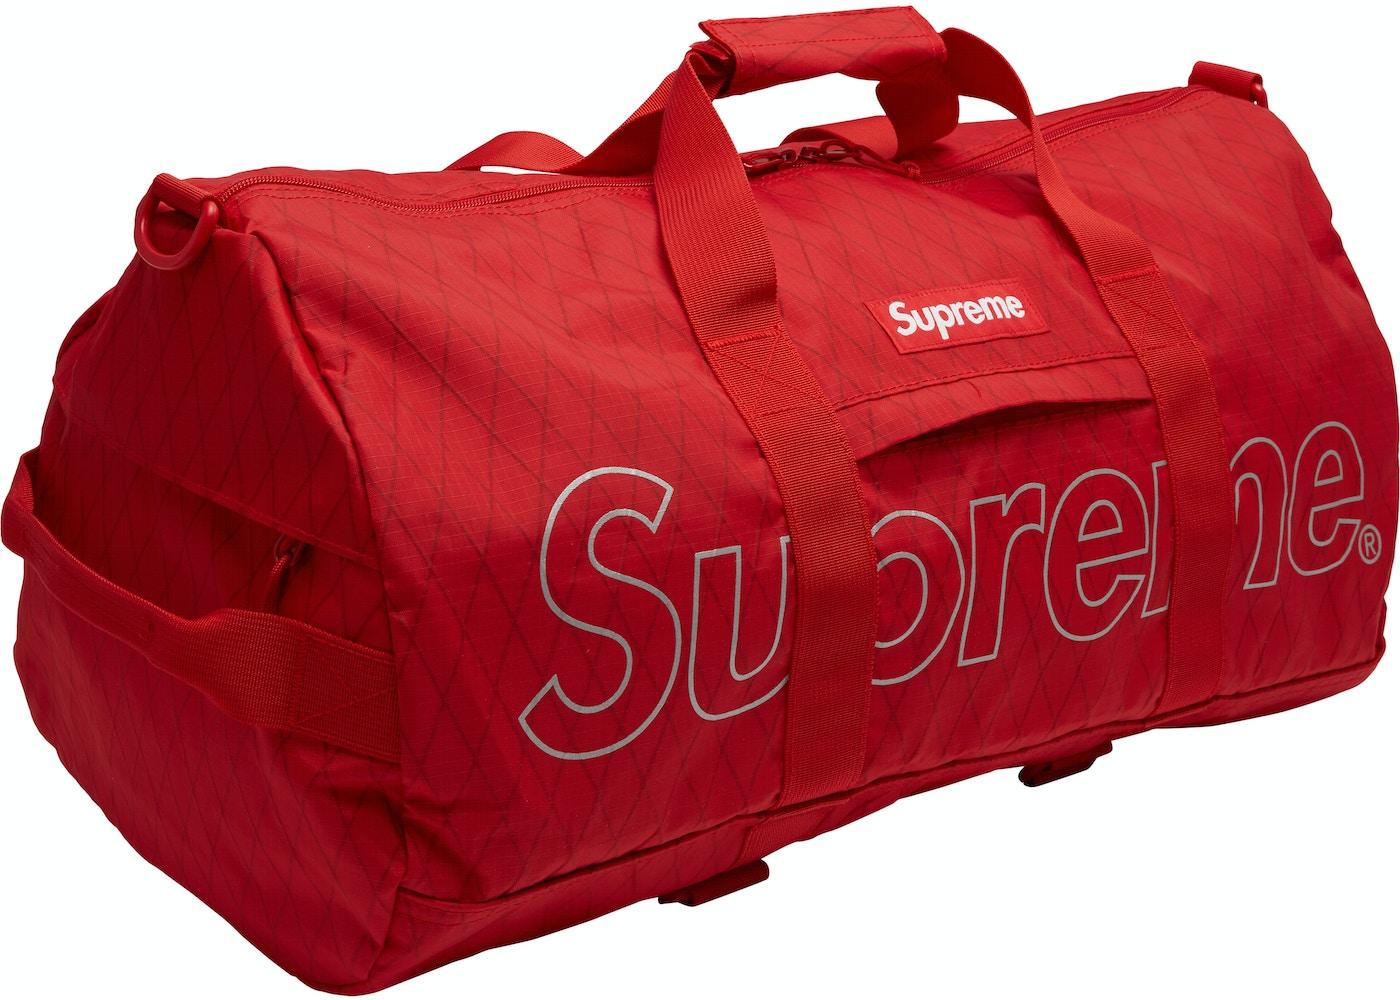 ca31d3ce1d0d Buy   Sell Supreme Streetwear - New Highest Bids